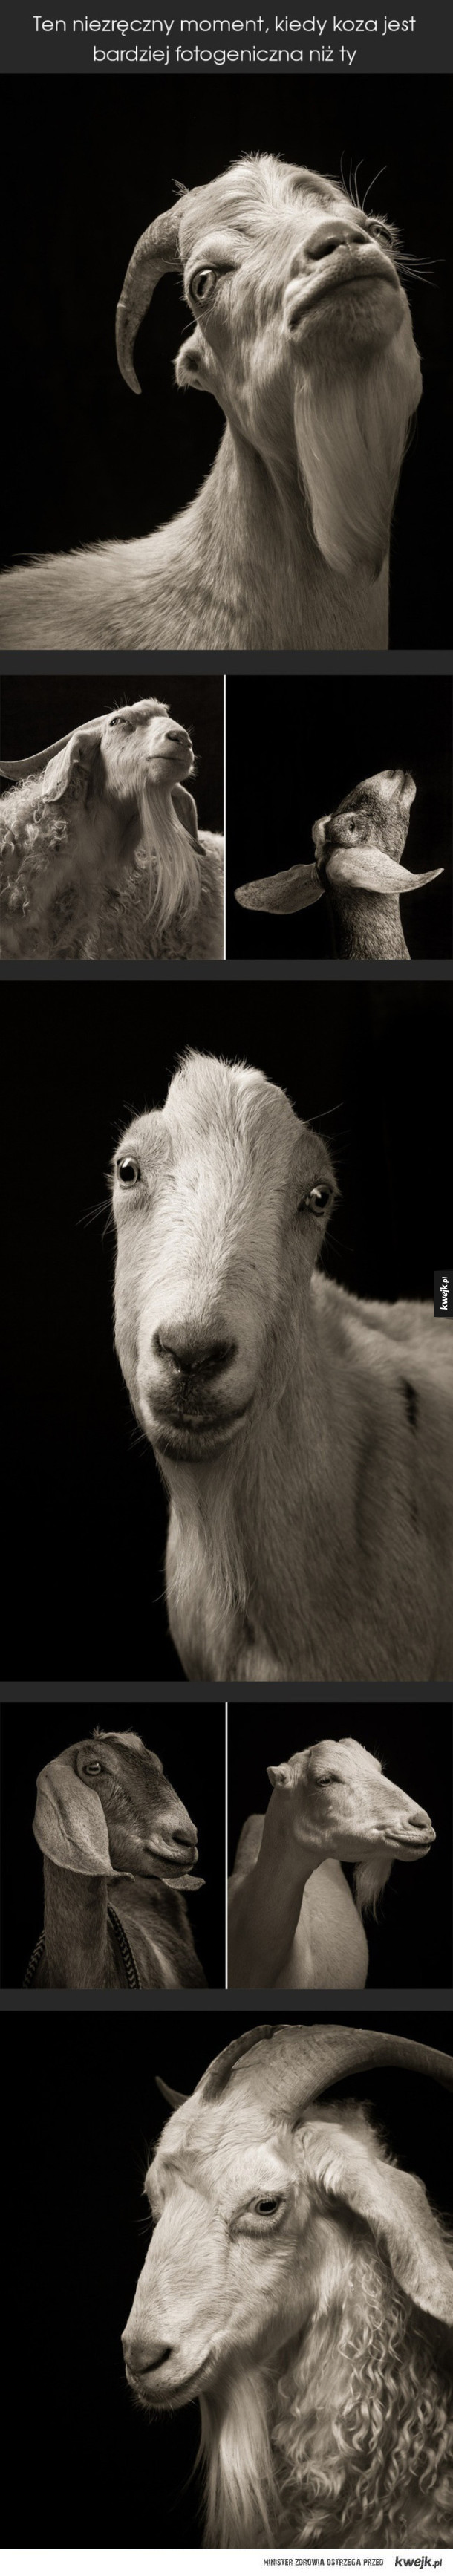 Fotogeniczna koza